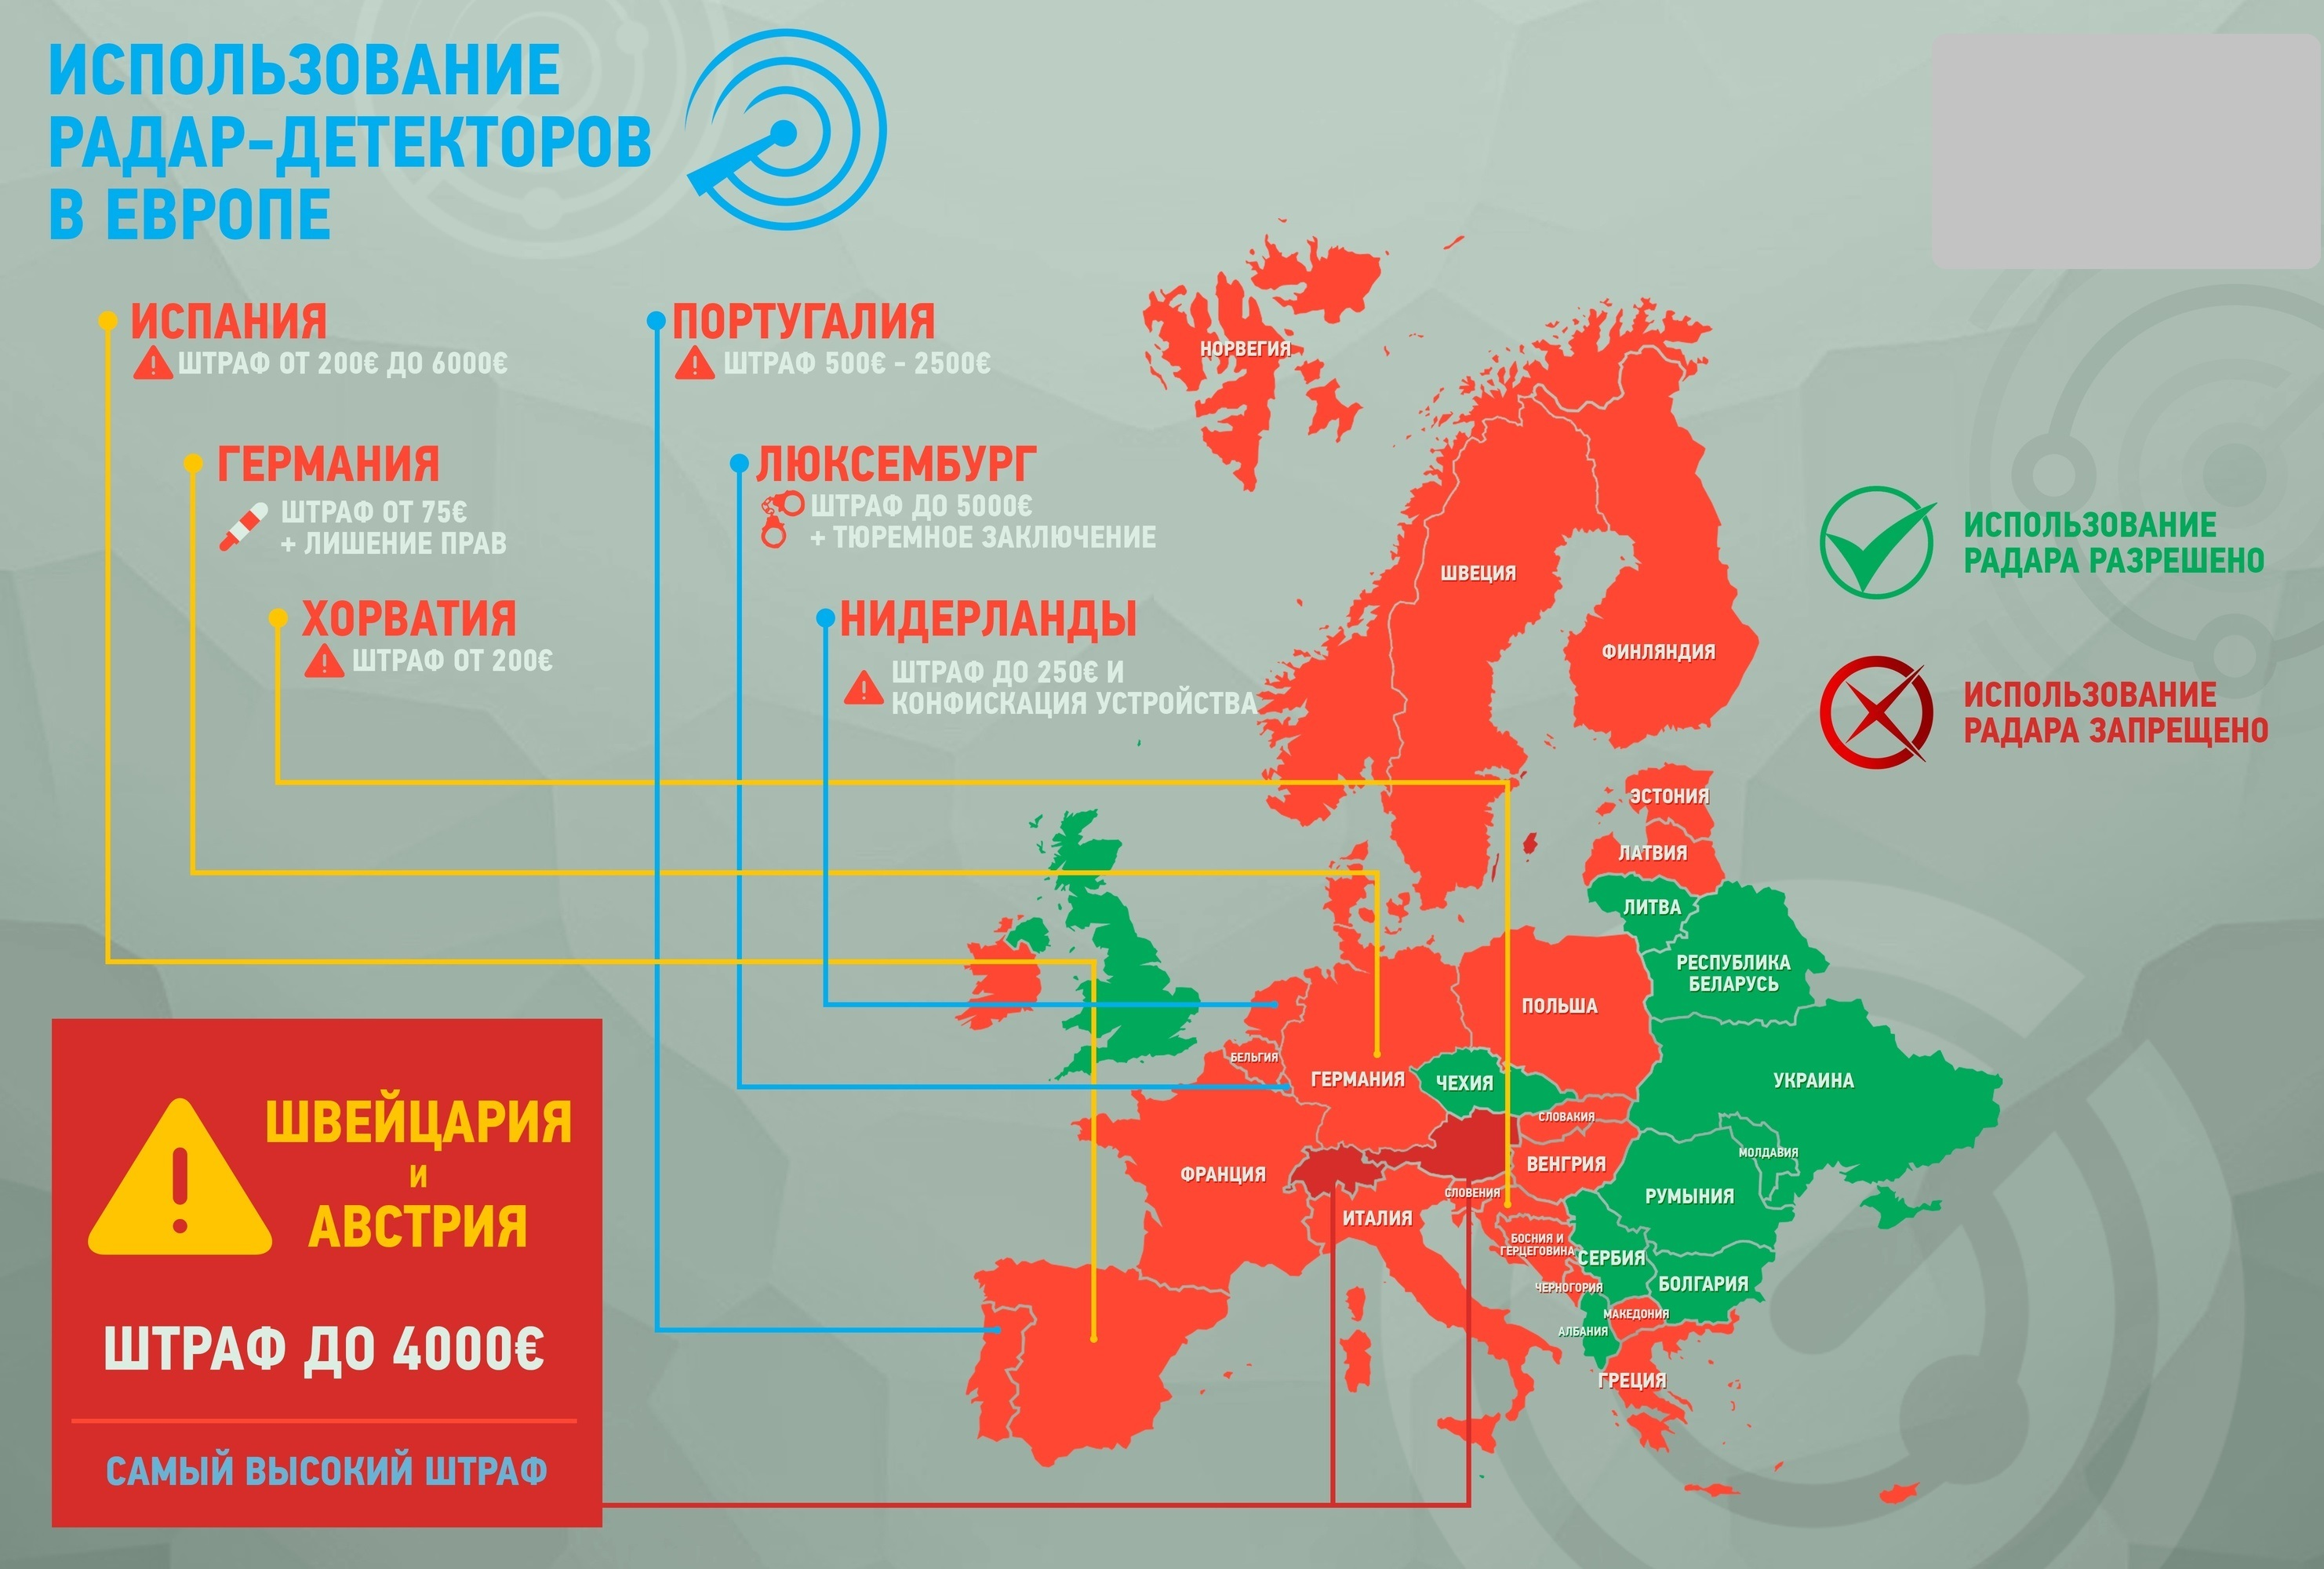 Страны Европы, где запрещены «антирадары» 1